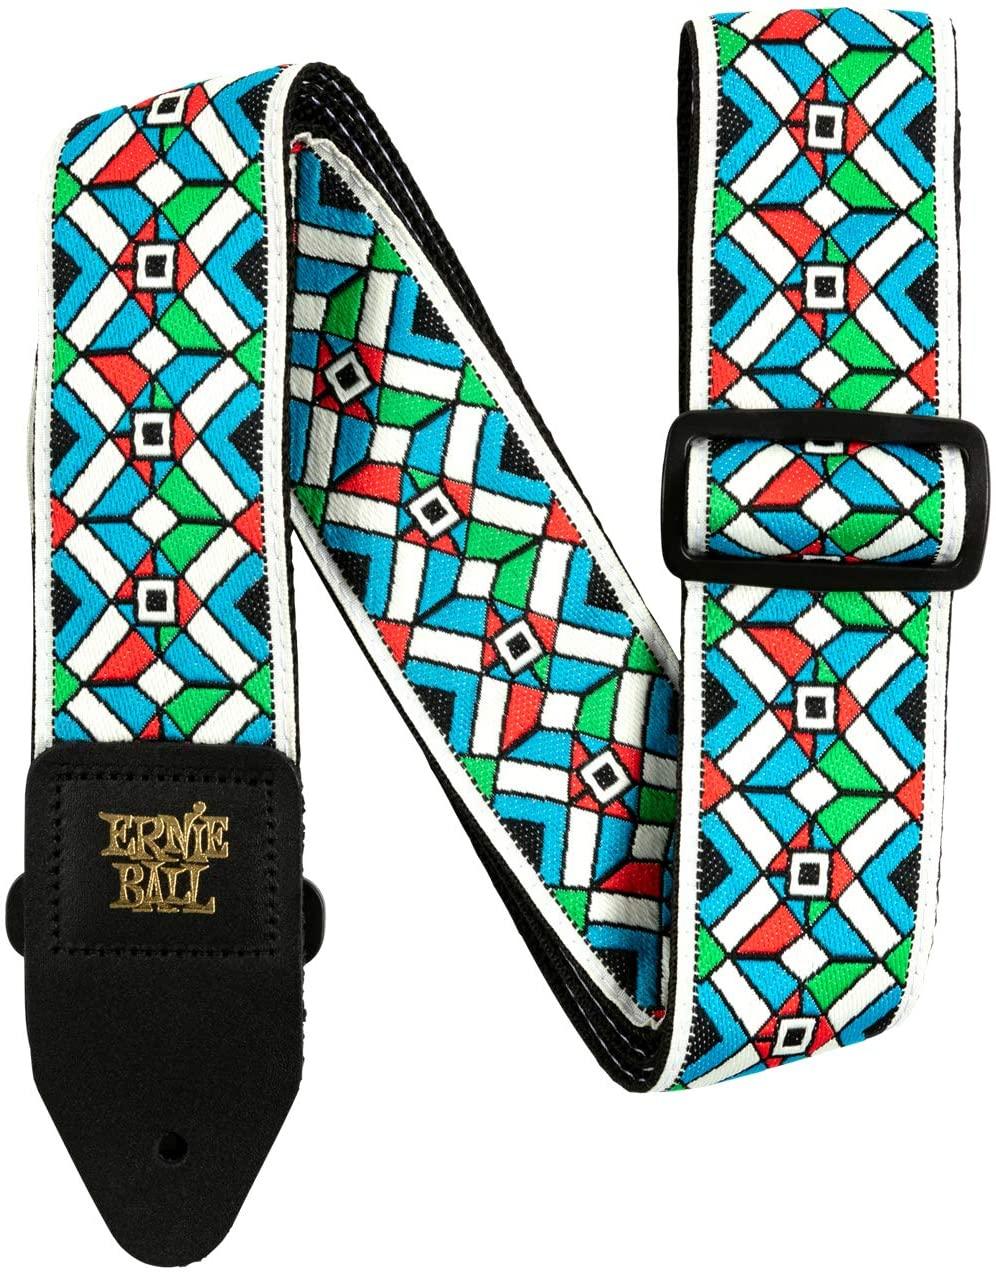 Ernie Ball P04659 Kaleidoscope Blue Strap